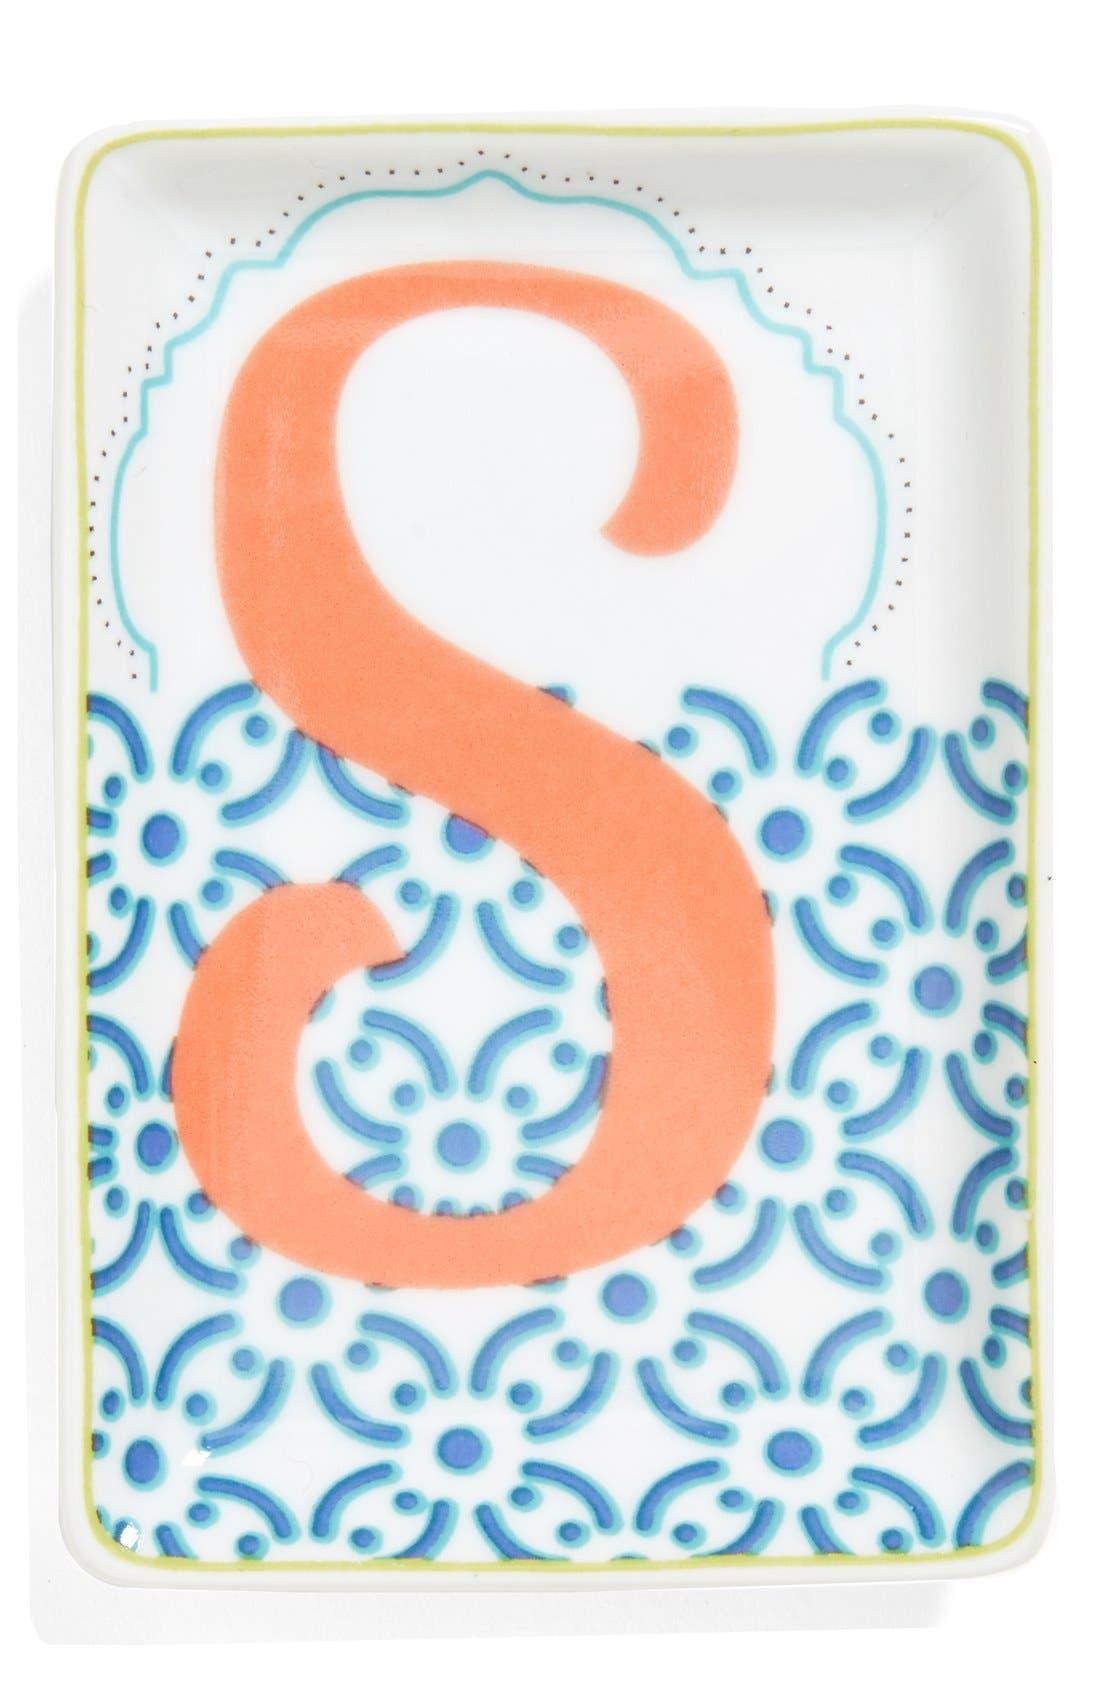 Main Image - Rosanna 'Letterpress' Personalized Porcelain Tray